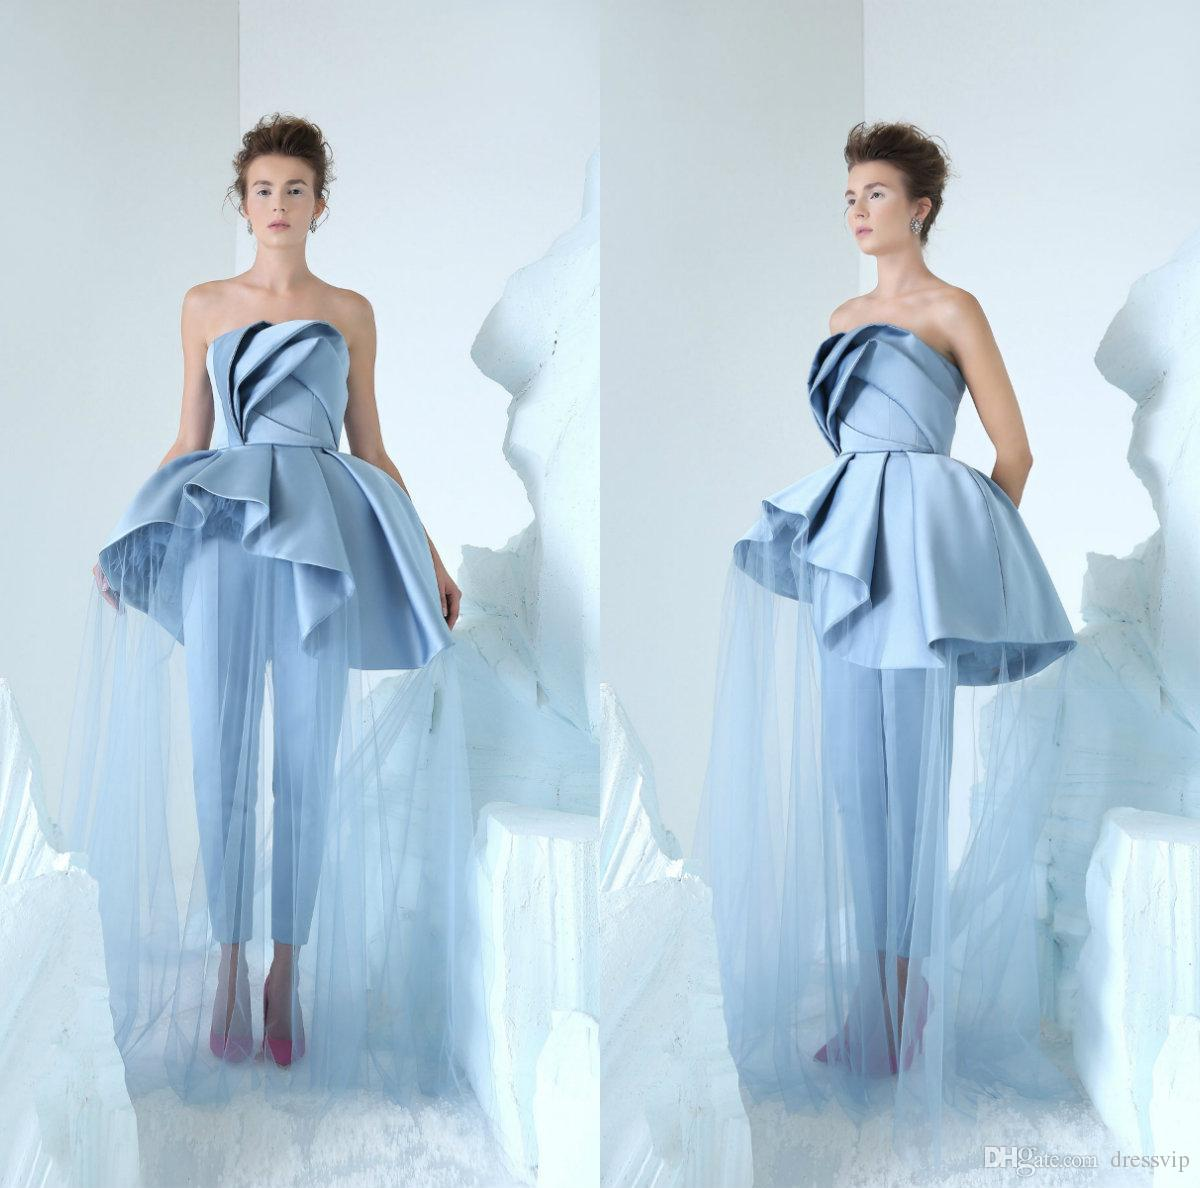 ccefa330db5 2019 Azzi Osta Fashion Women Jumpsuit Prom Dresses Strapless Luxury Ruffles  Organza Satin Custom Made Evening Dress Party Wear Girls Gowns Long White  ...